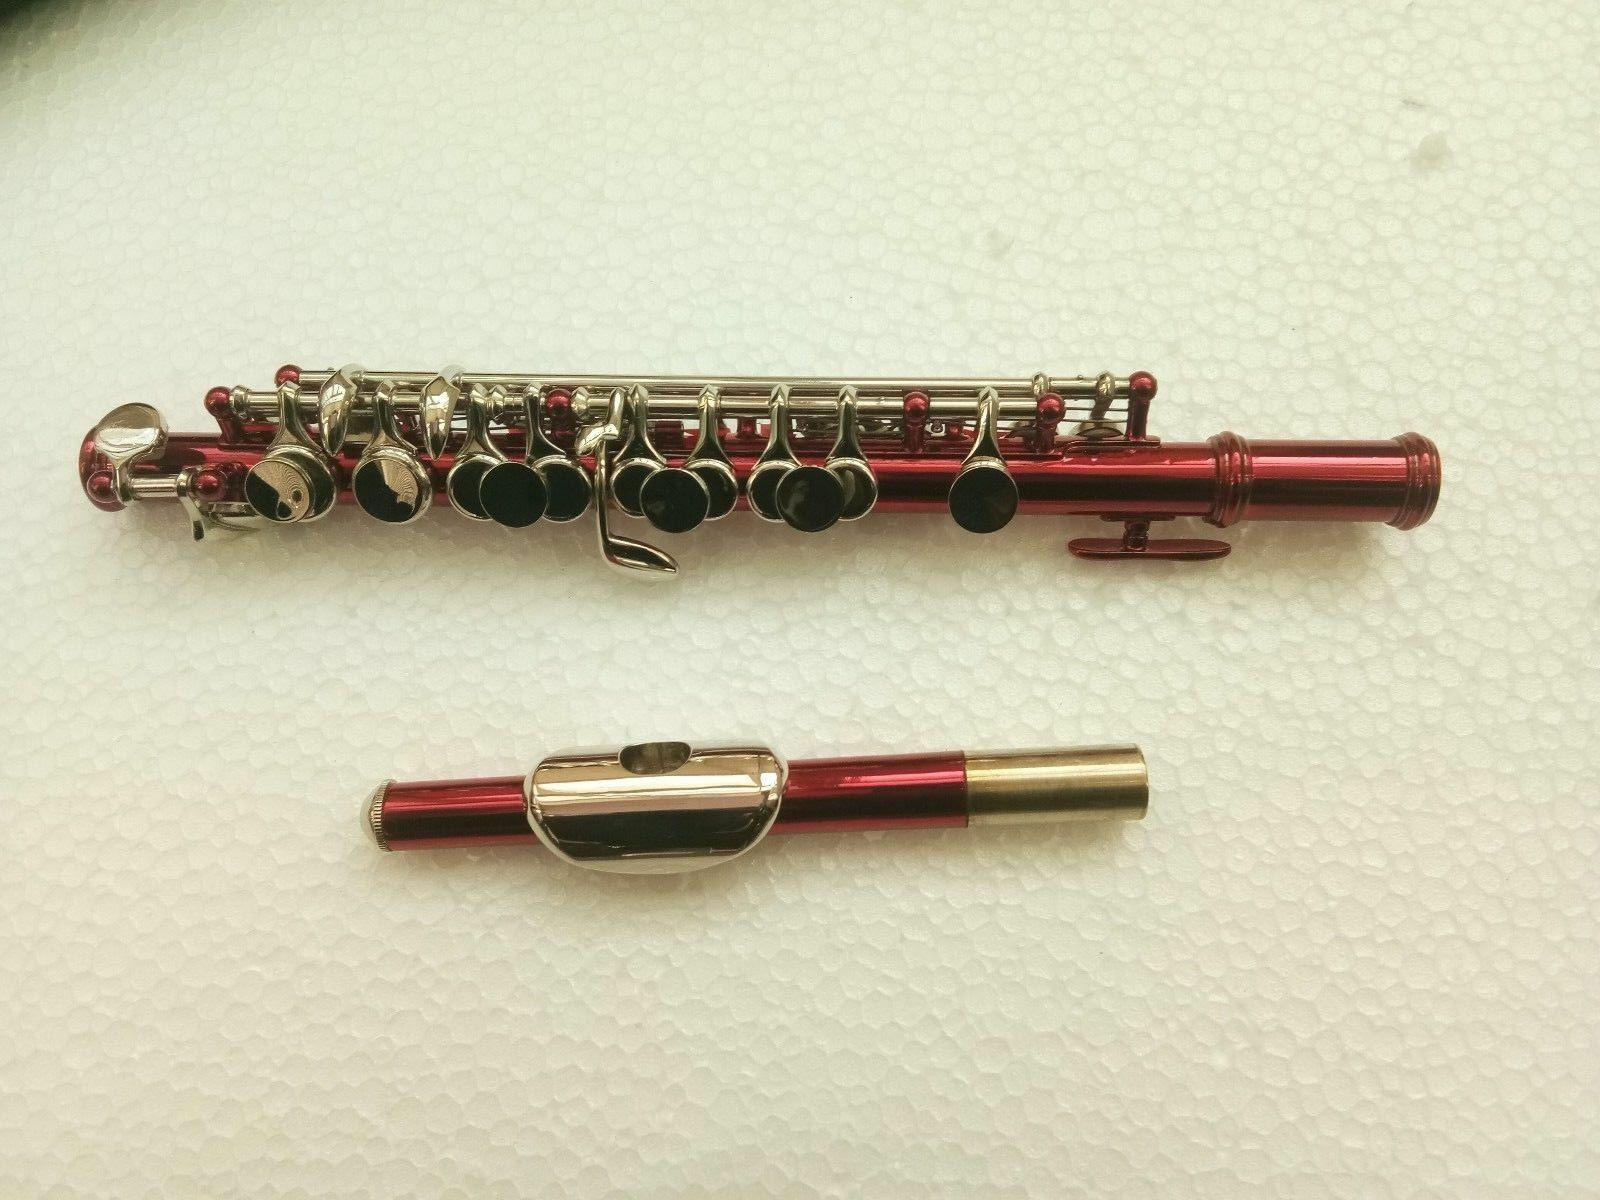 Neuer roter Piccolo c key real Nickel überzogen großes Material